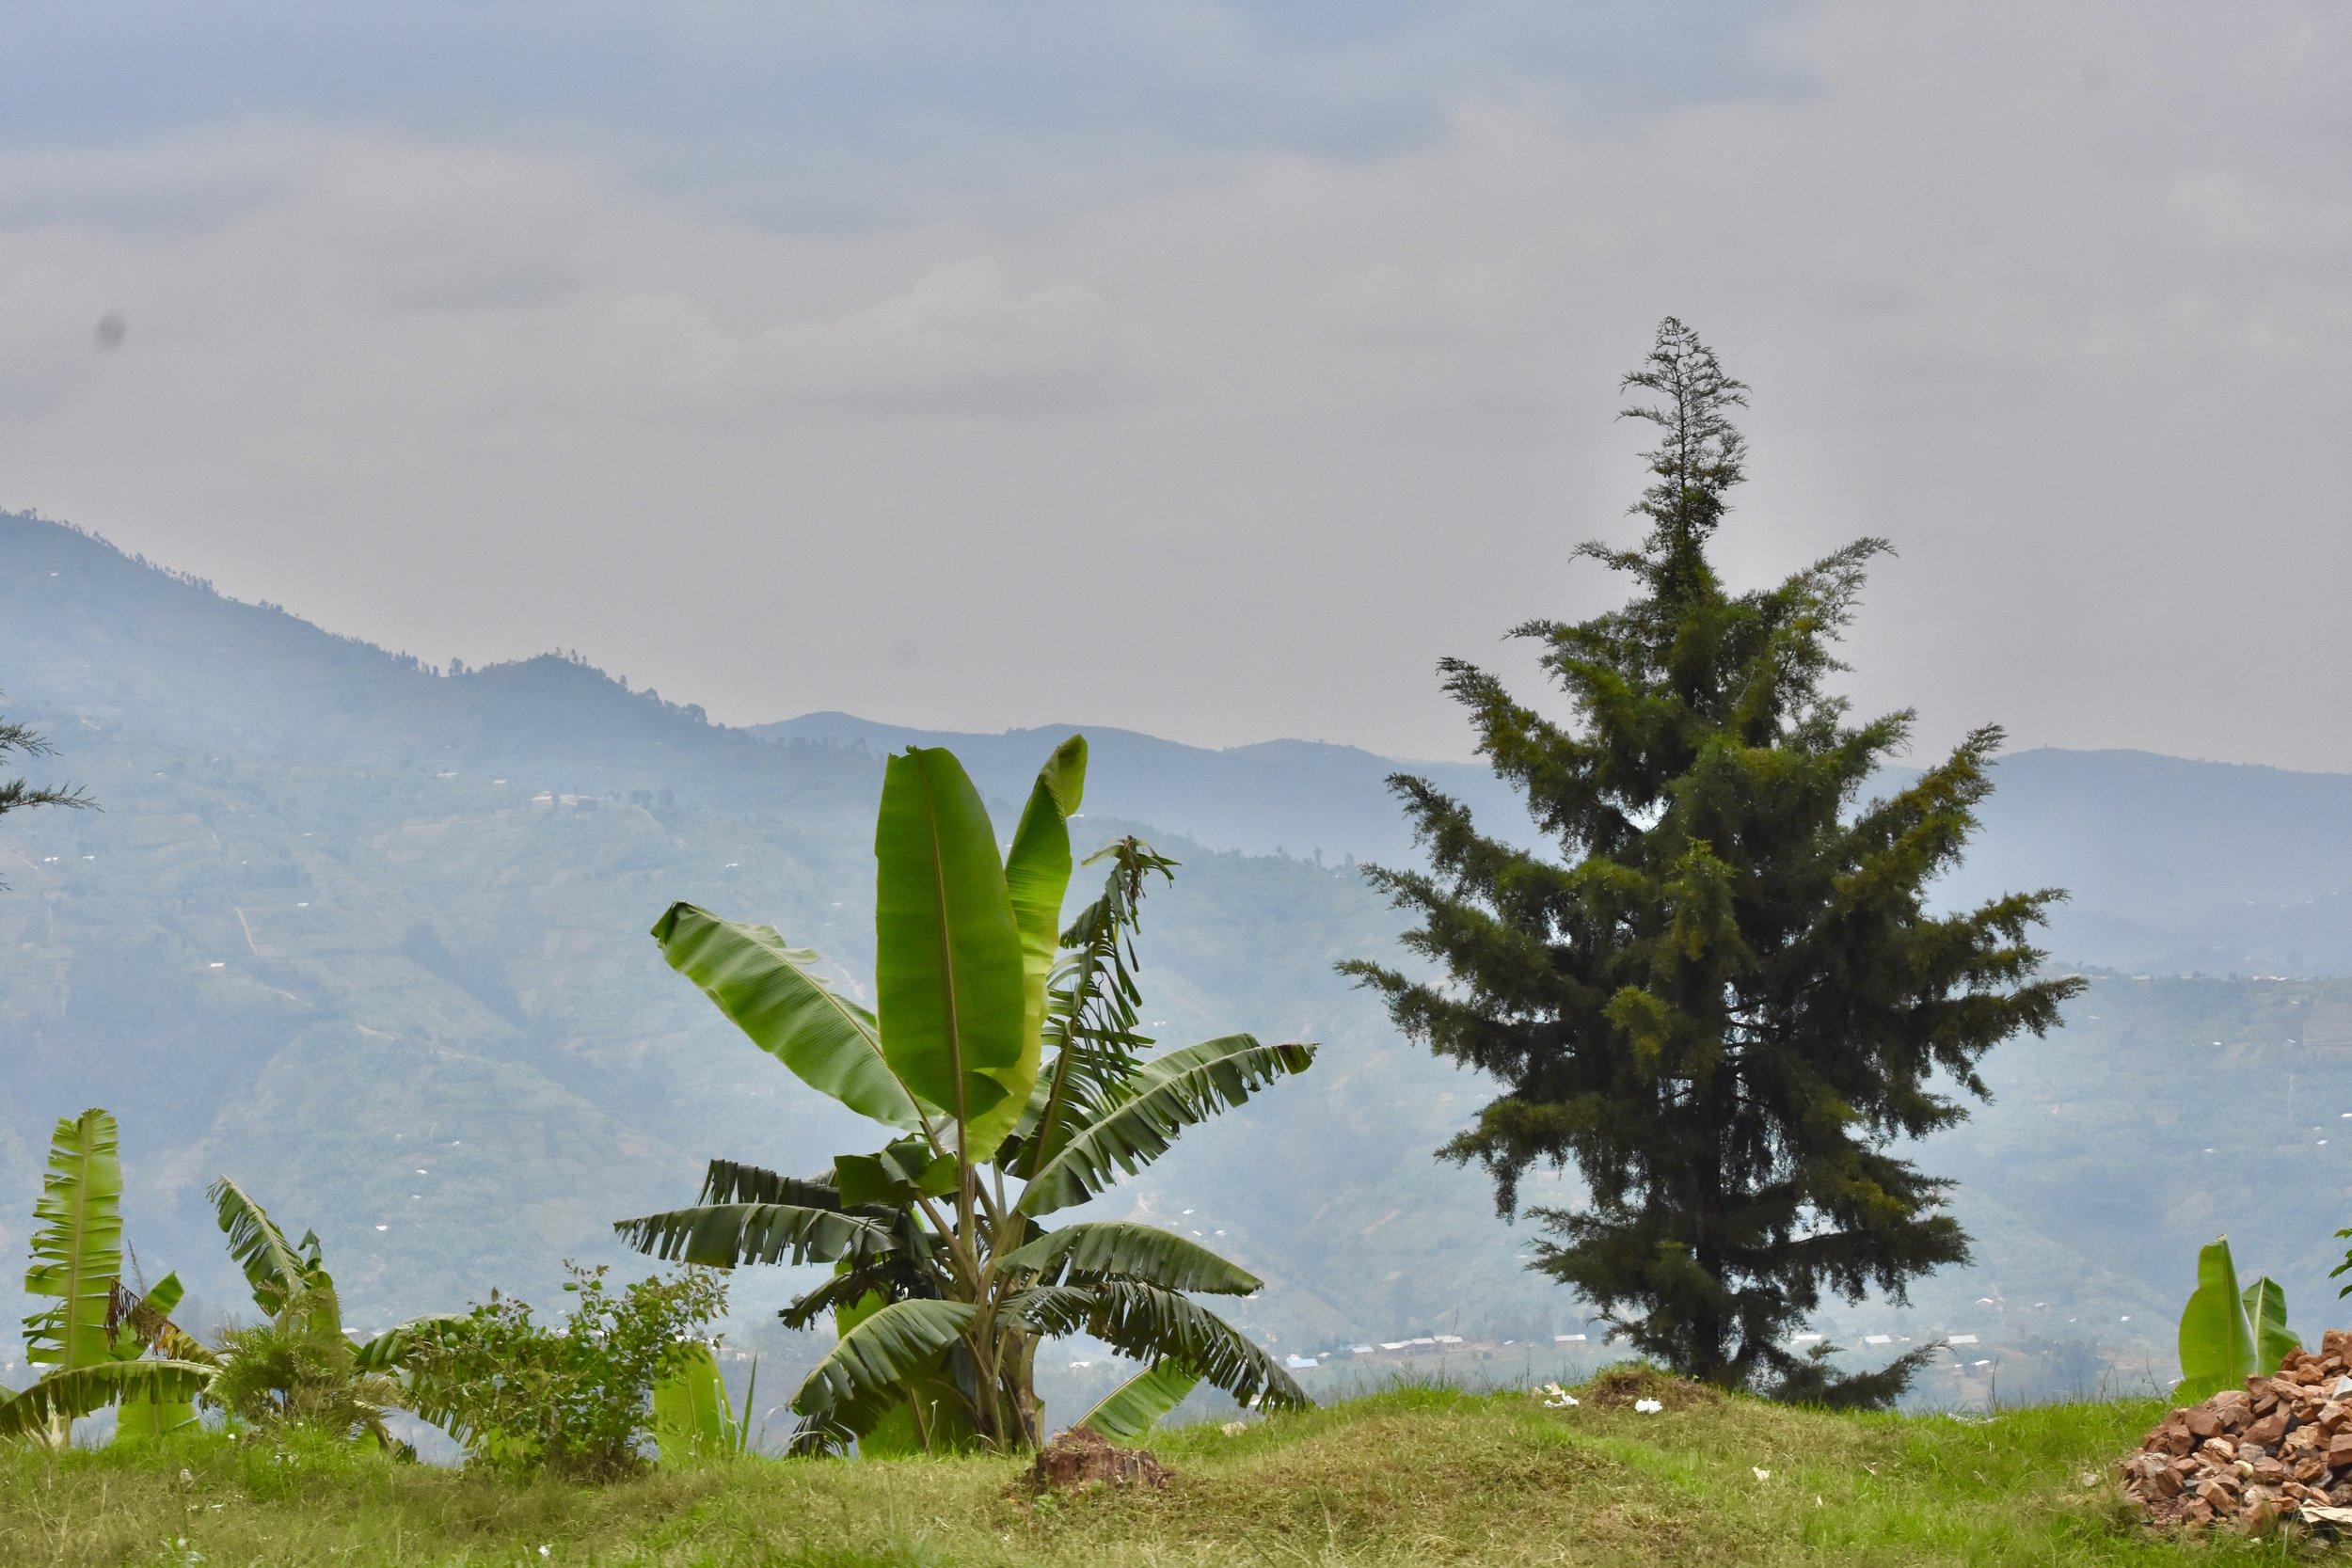 Views of the hills in Rwanda